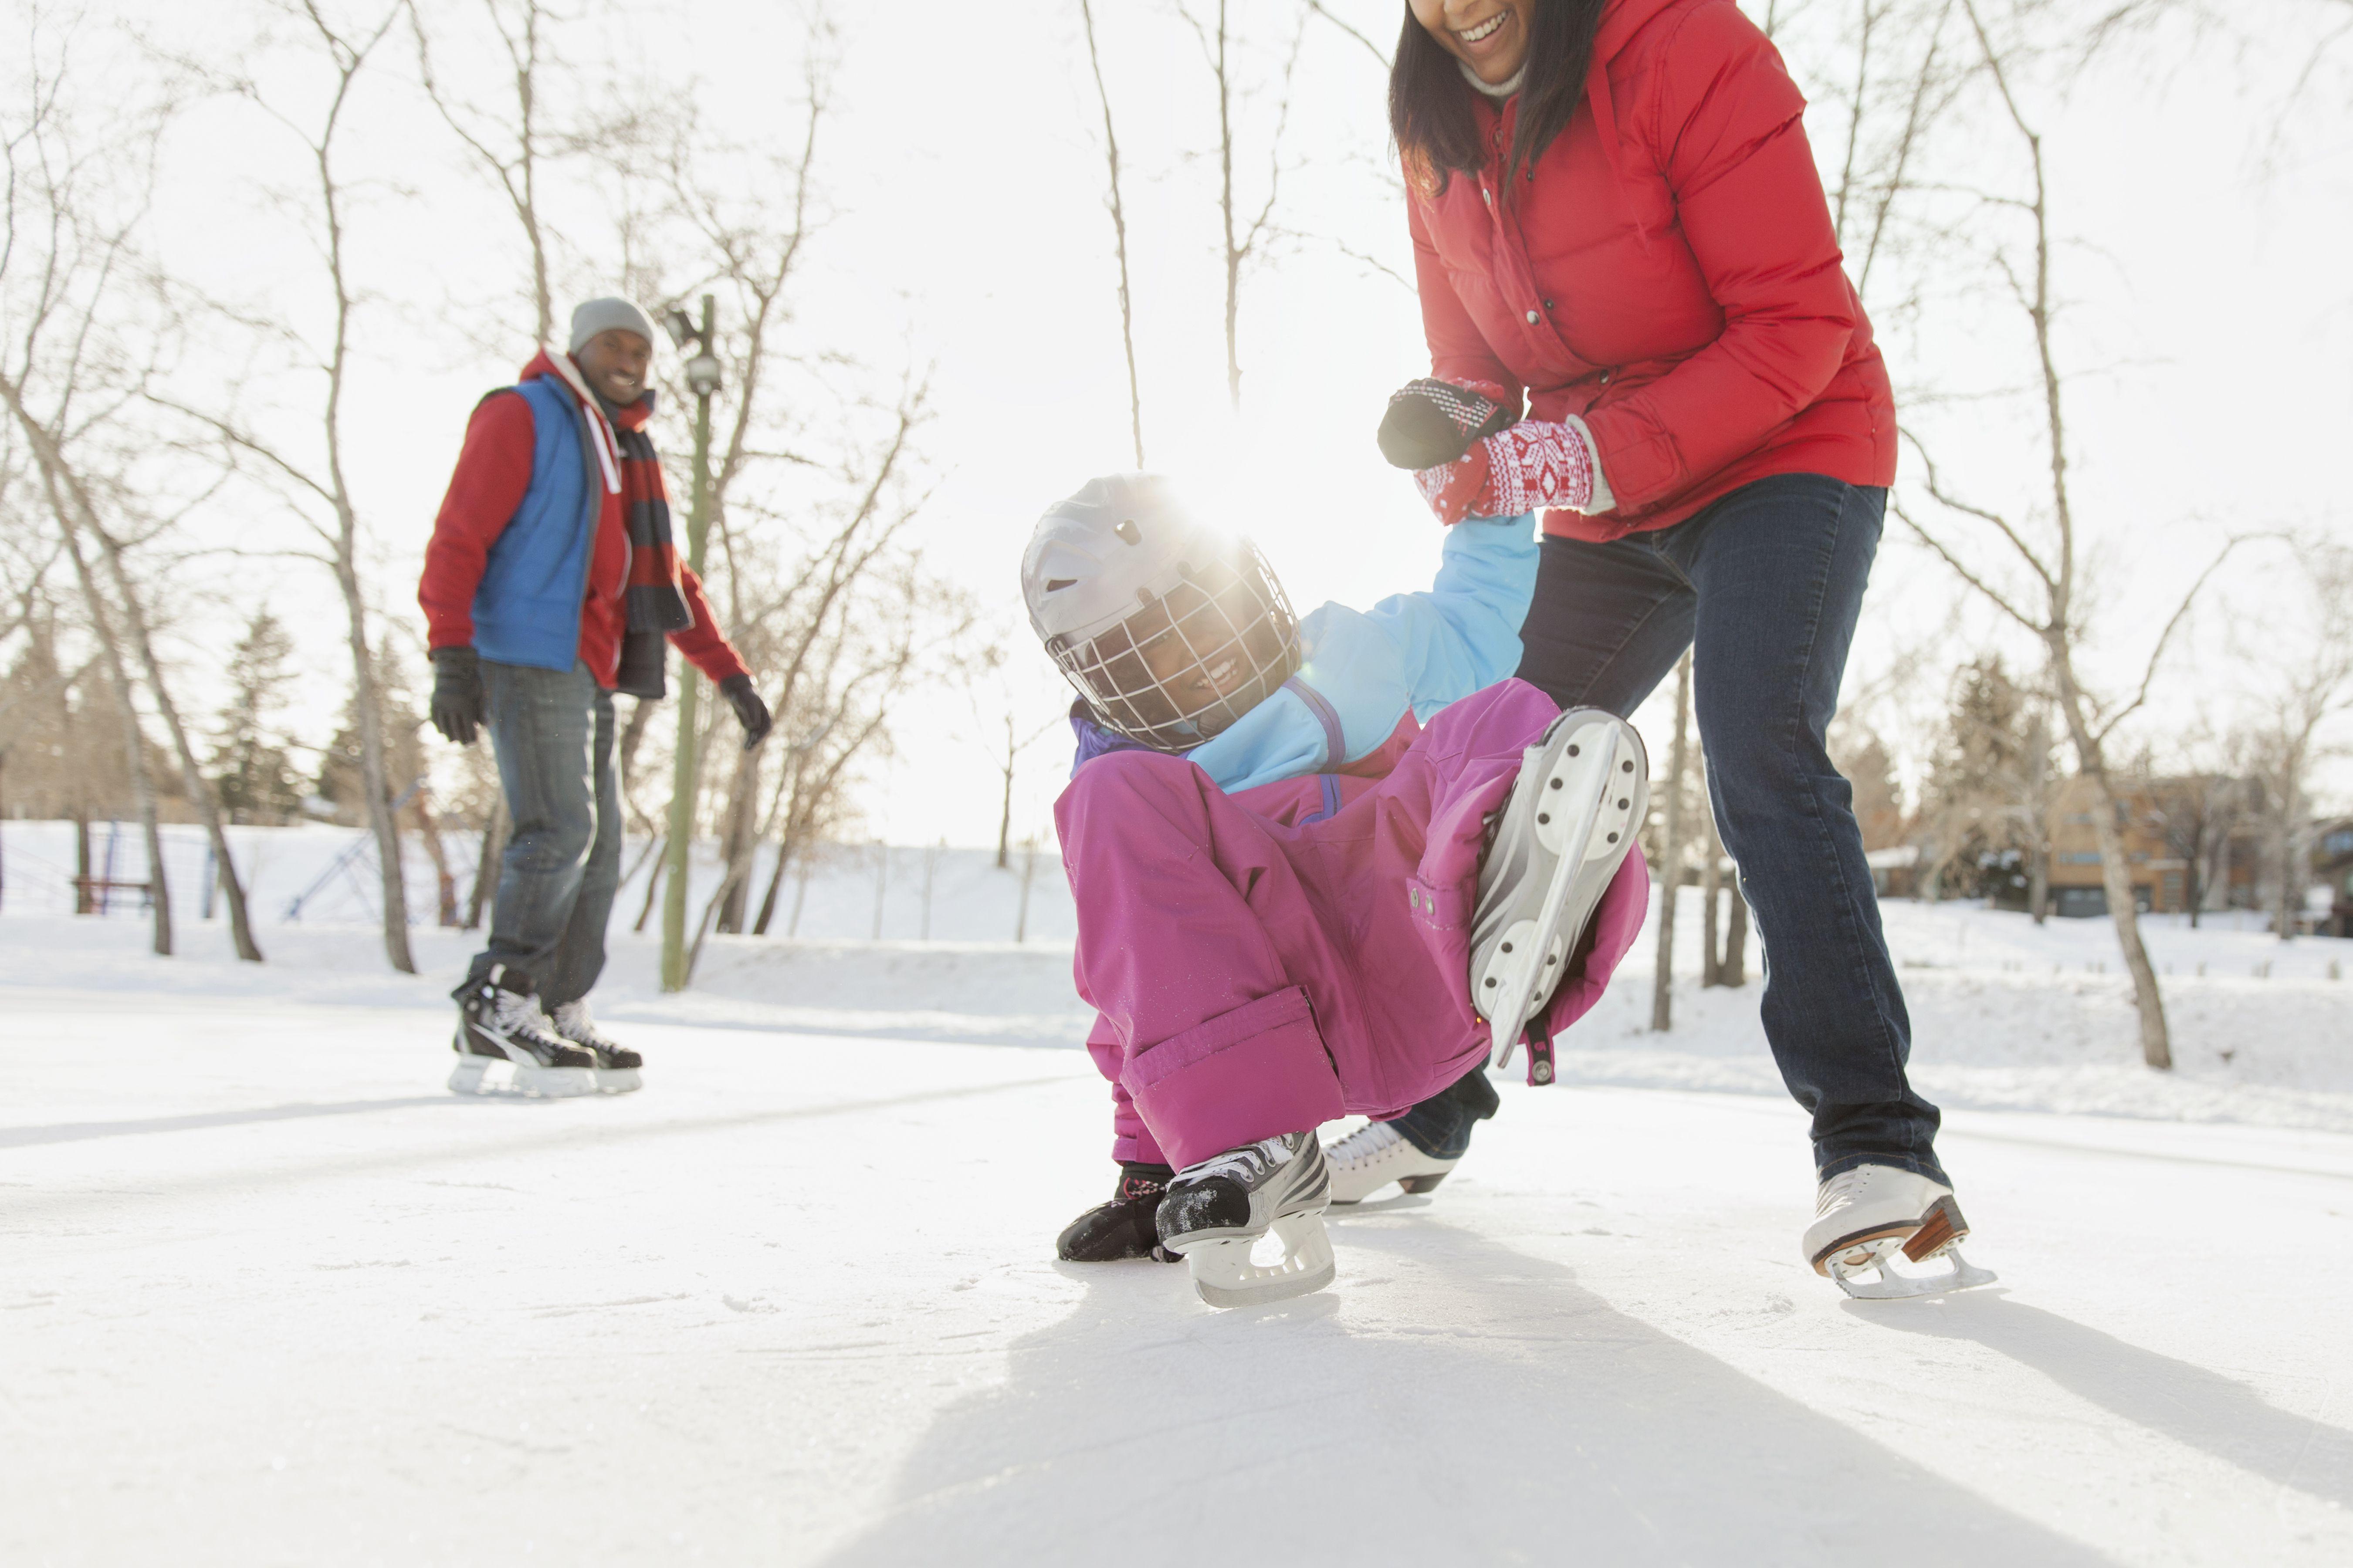 Family ice-skating outdoors